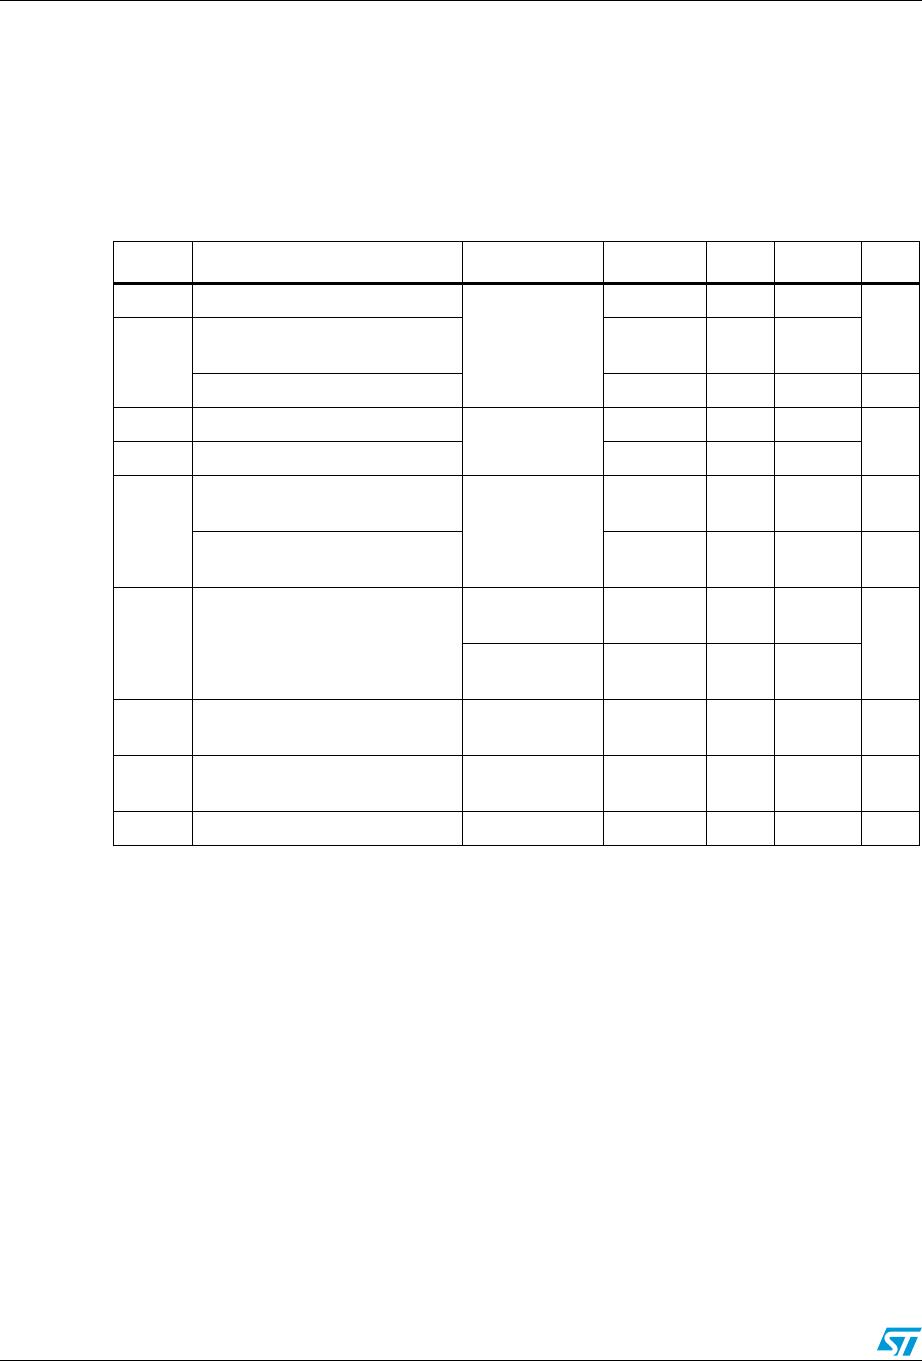 medium resolution of electrical characteristics stm32f103x8 stm32f103xb